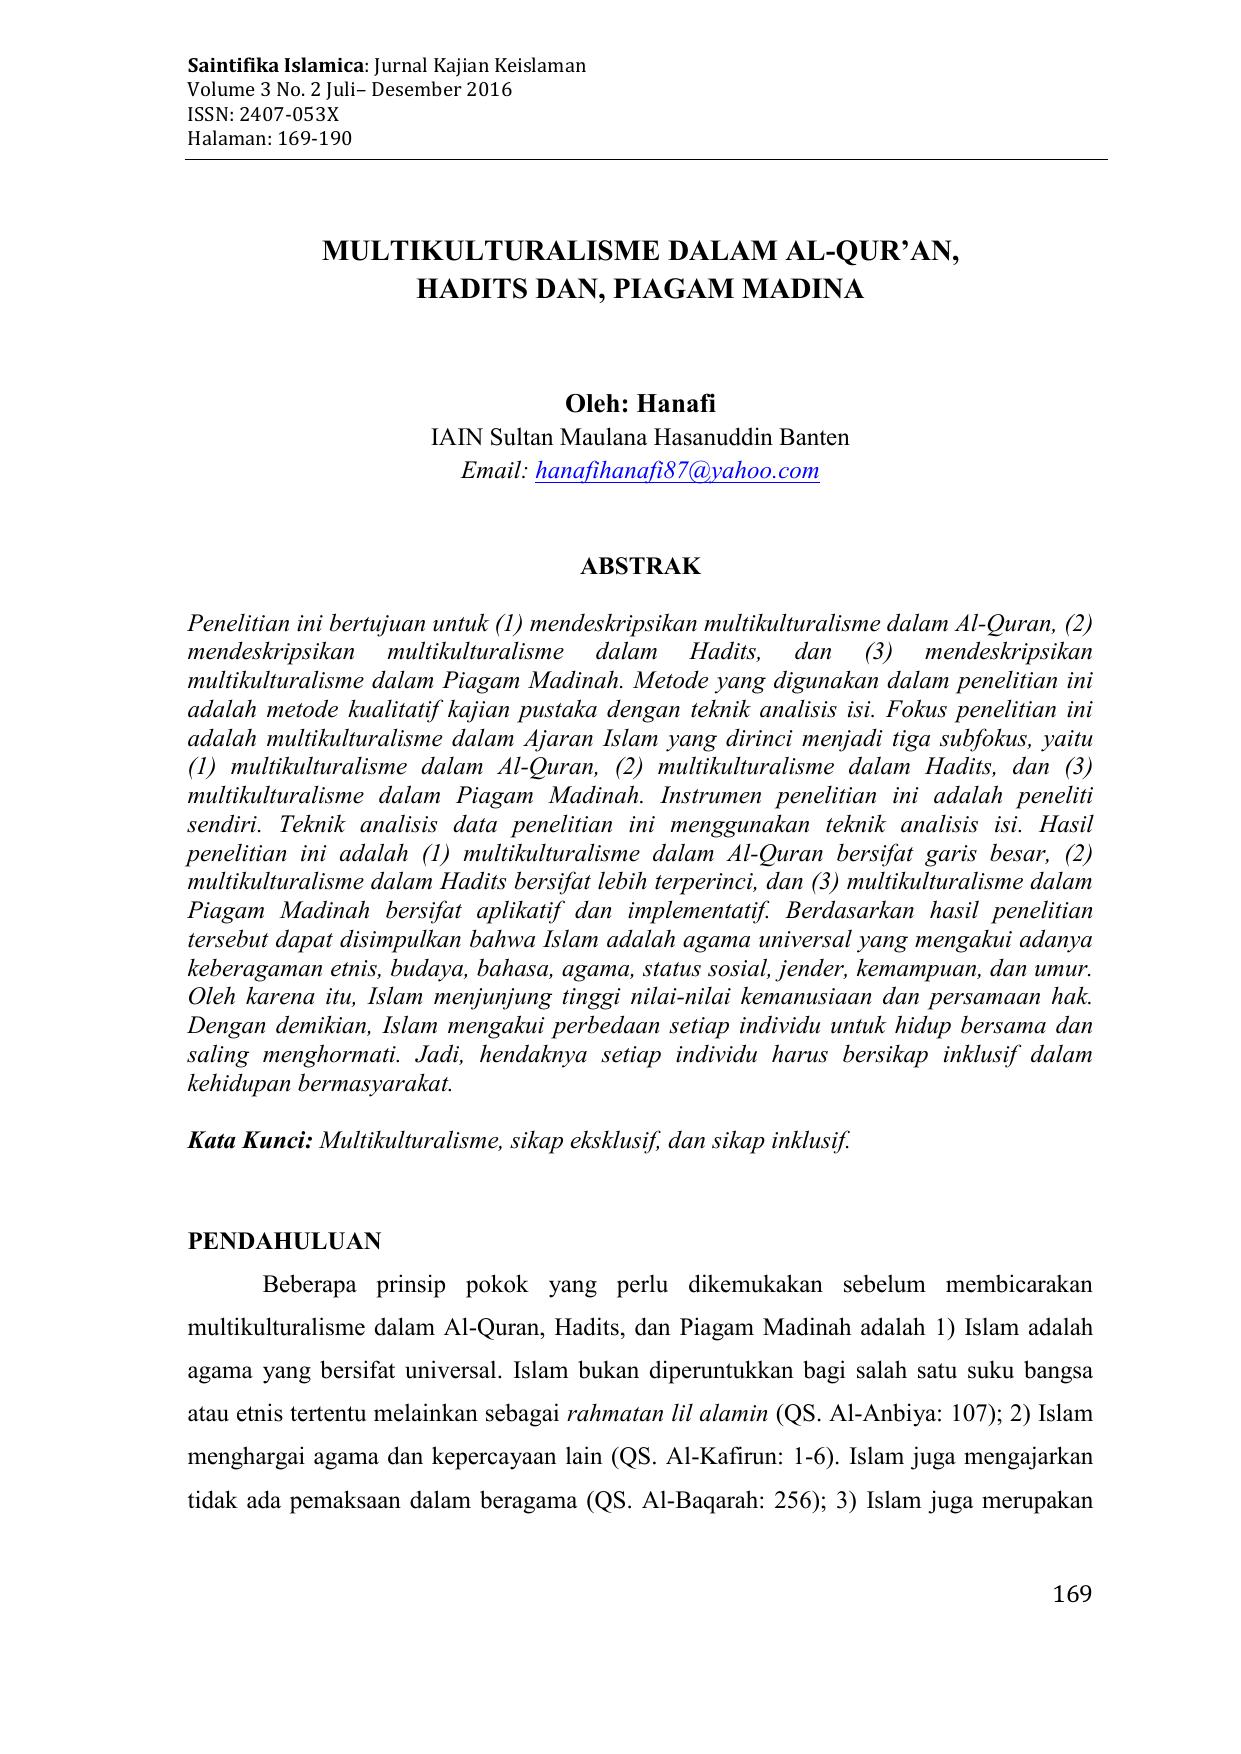 Multikulturalisme Dalam Al Quran Hadits Dan Piagam Madina